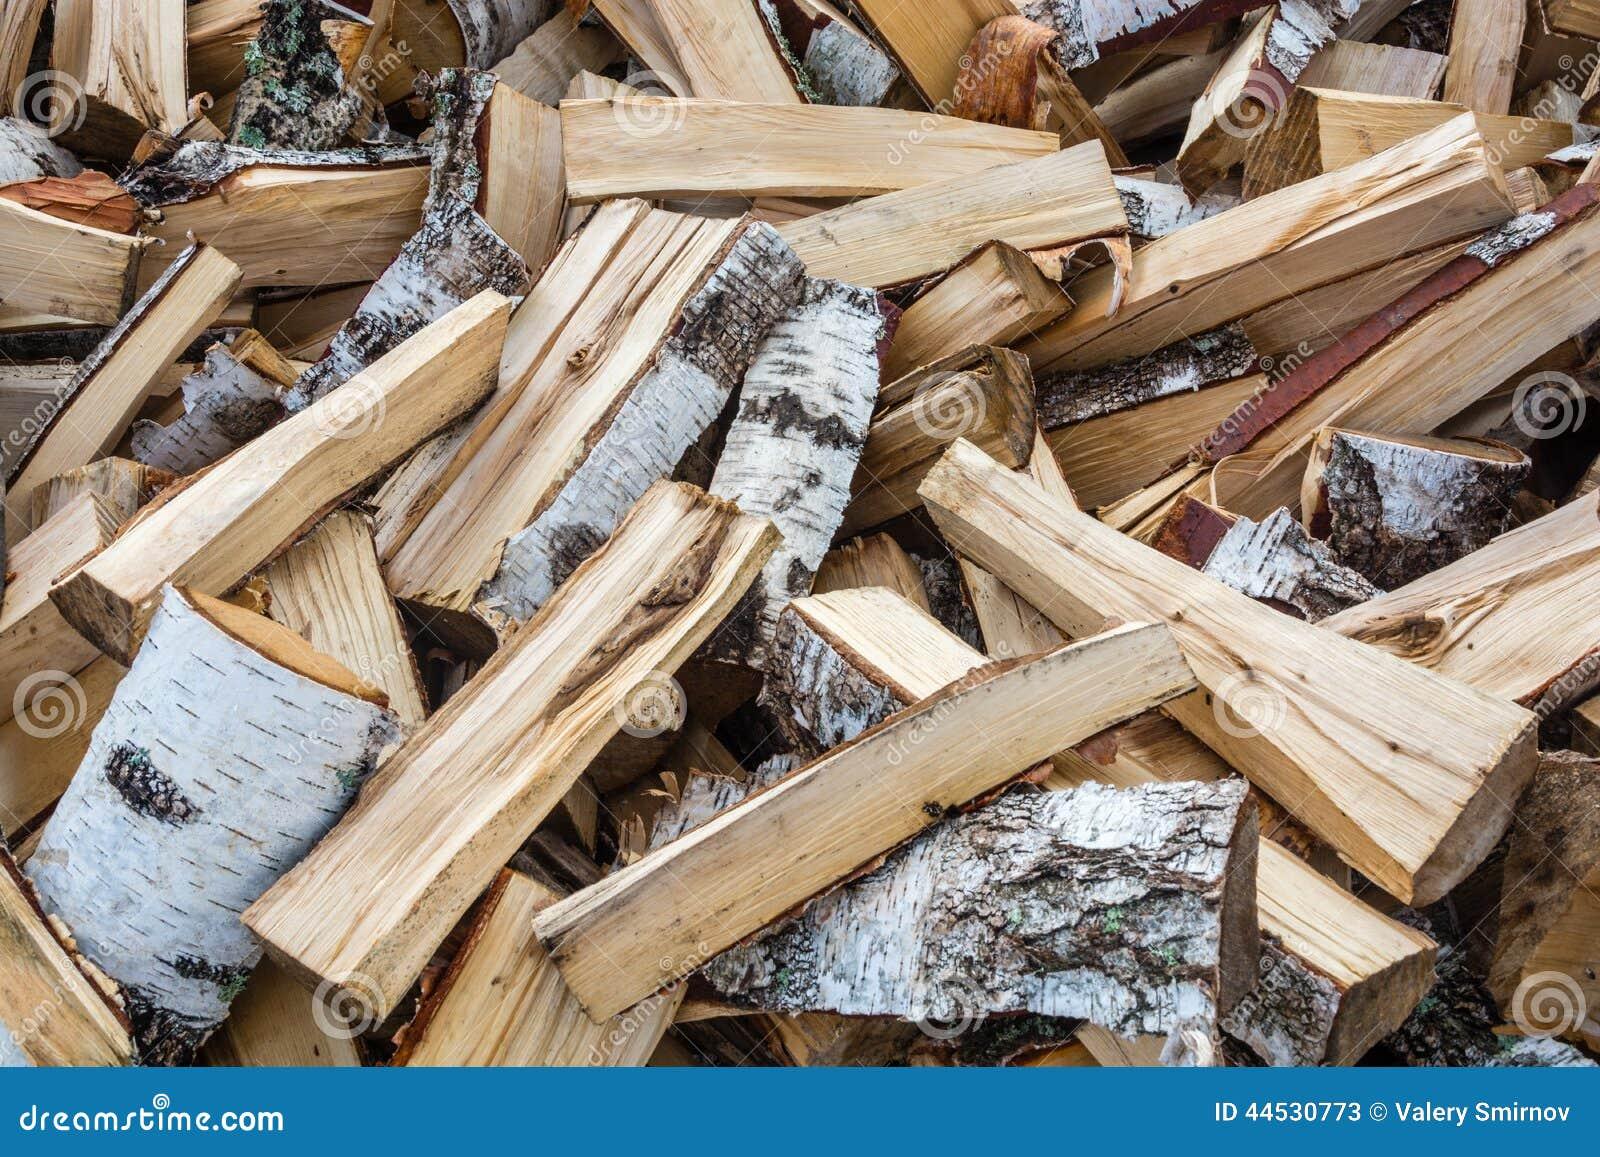 Bois de chauffage fendu de bouleau image stock image - Bois de chauffage peuplier ...